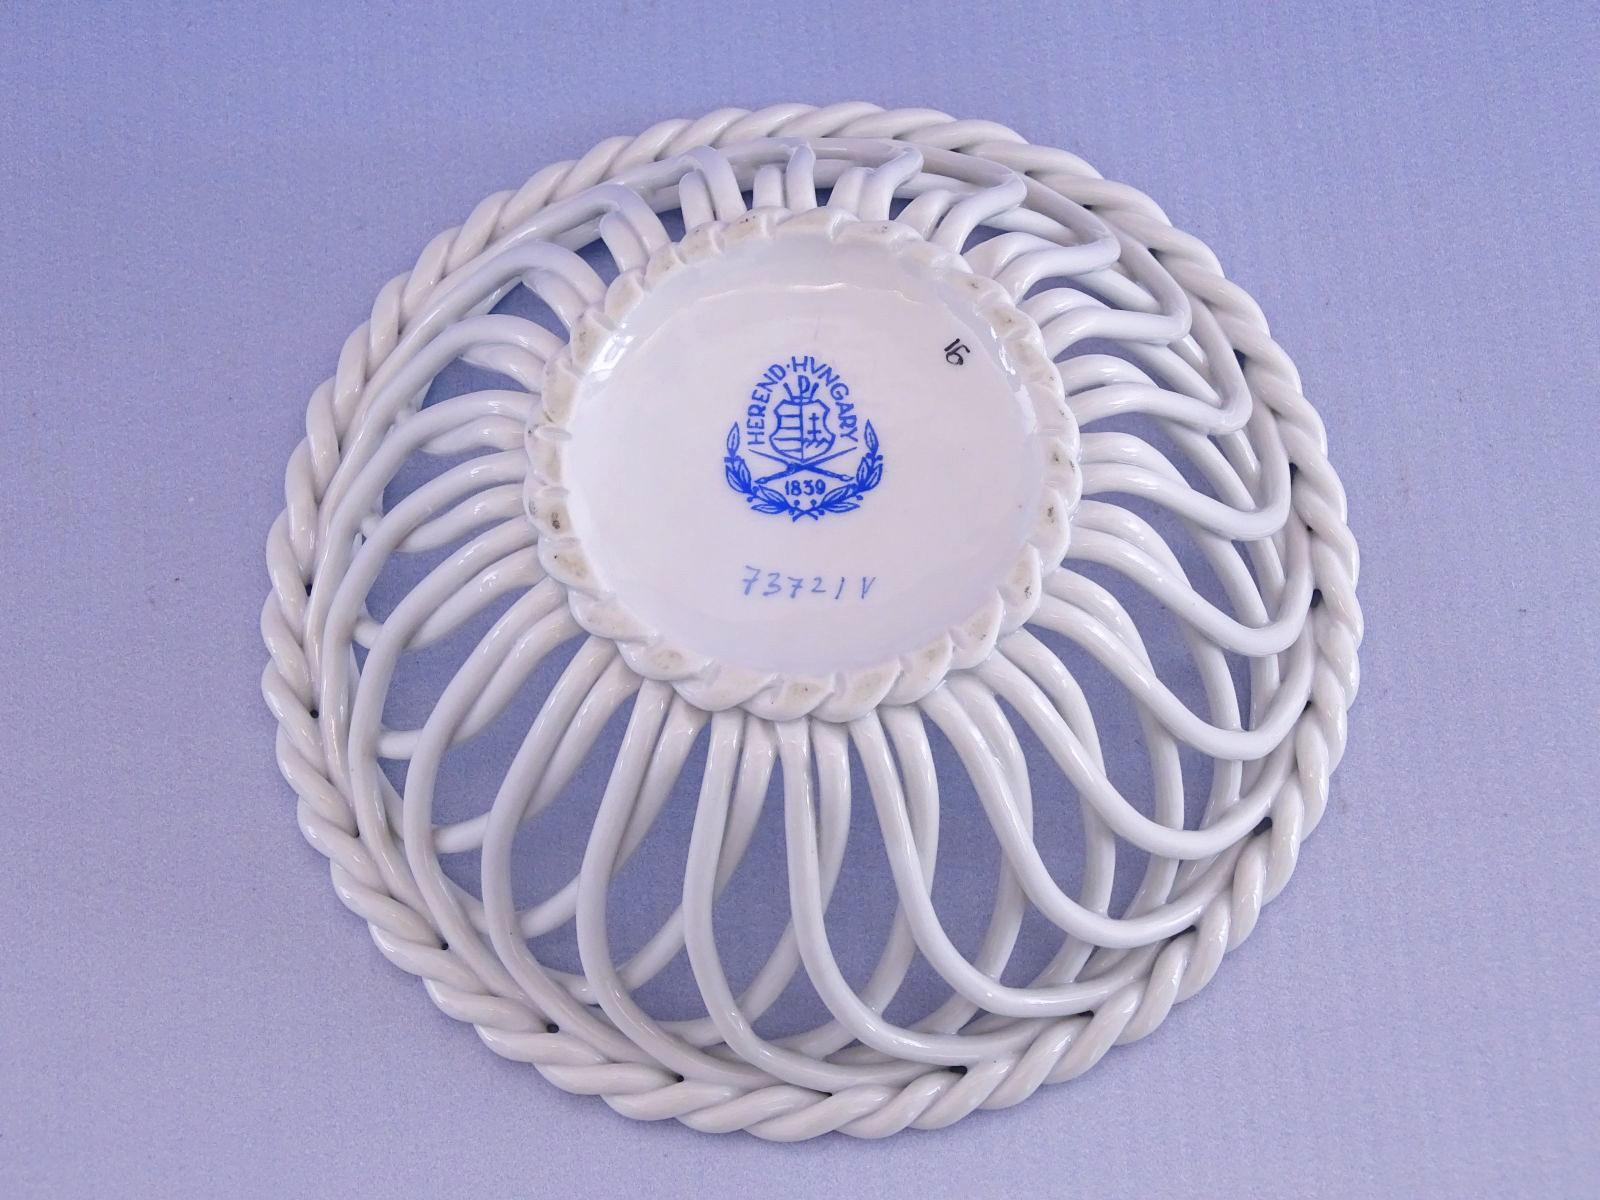 DSC09152.JPG (1600�1200)